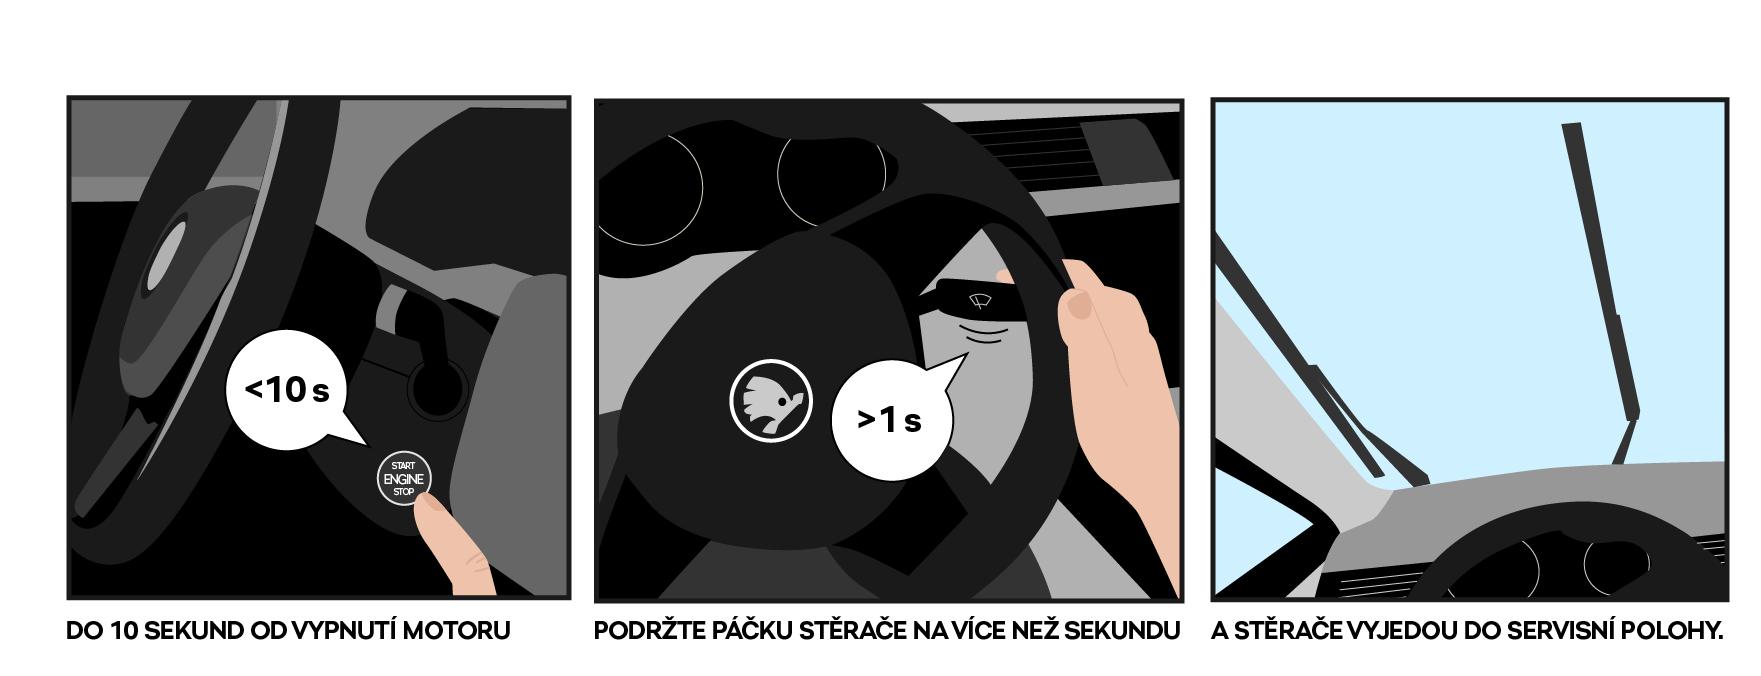 skoda_sterace_4_strip